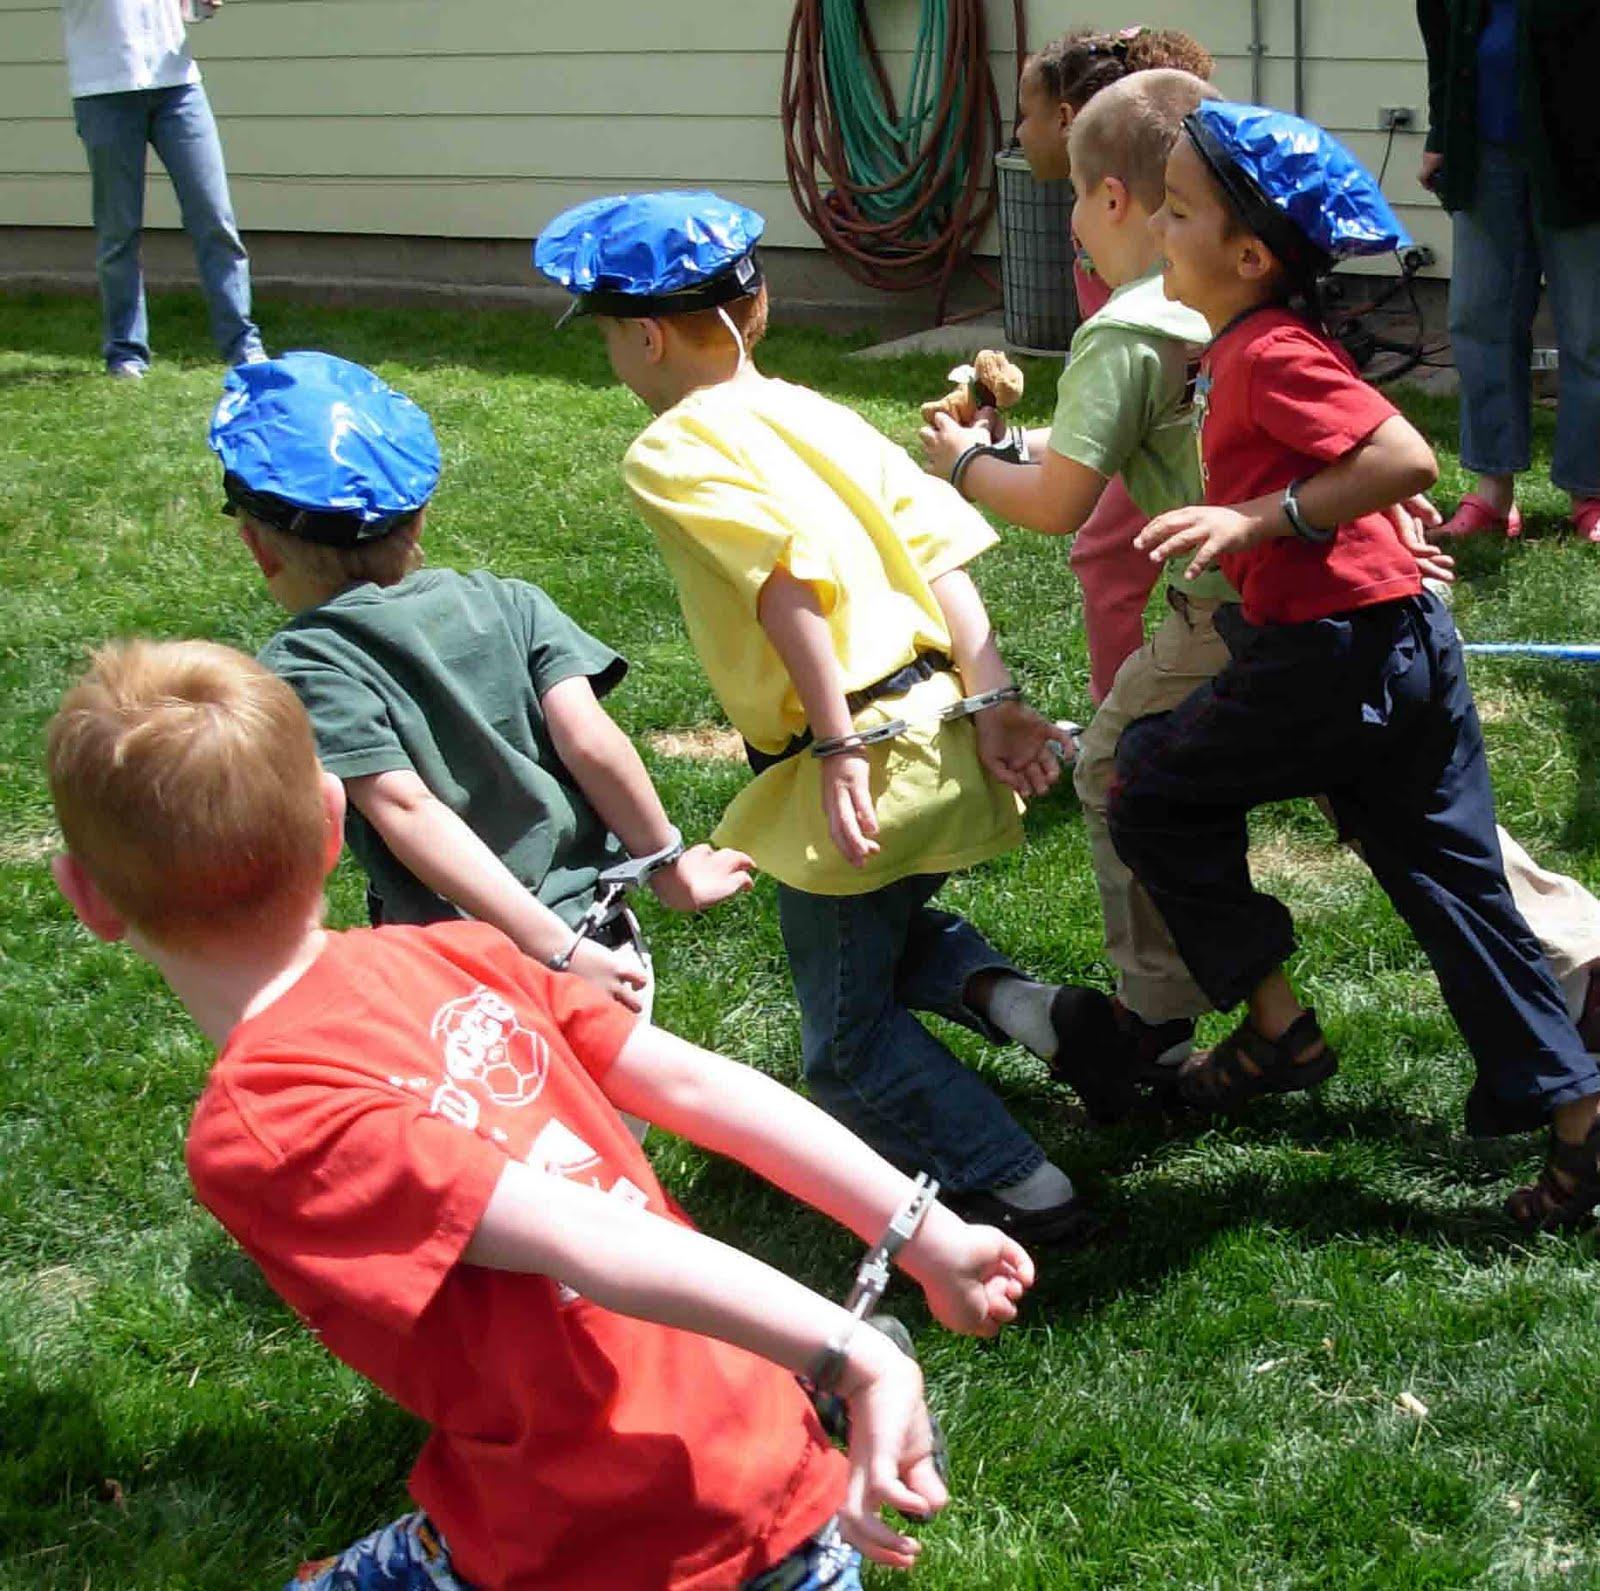 Kids Party Jail Game